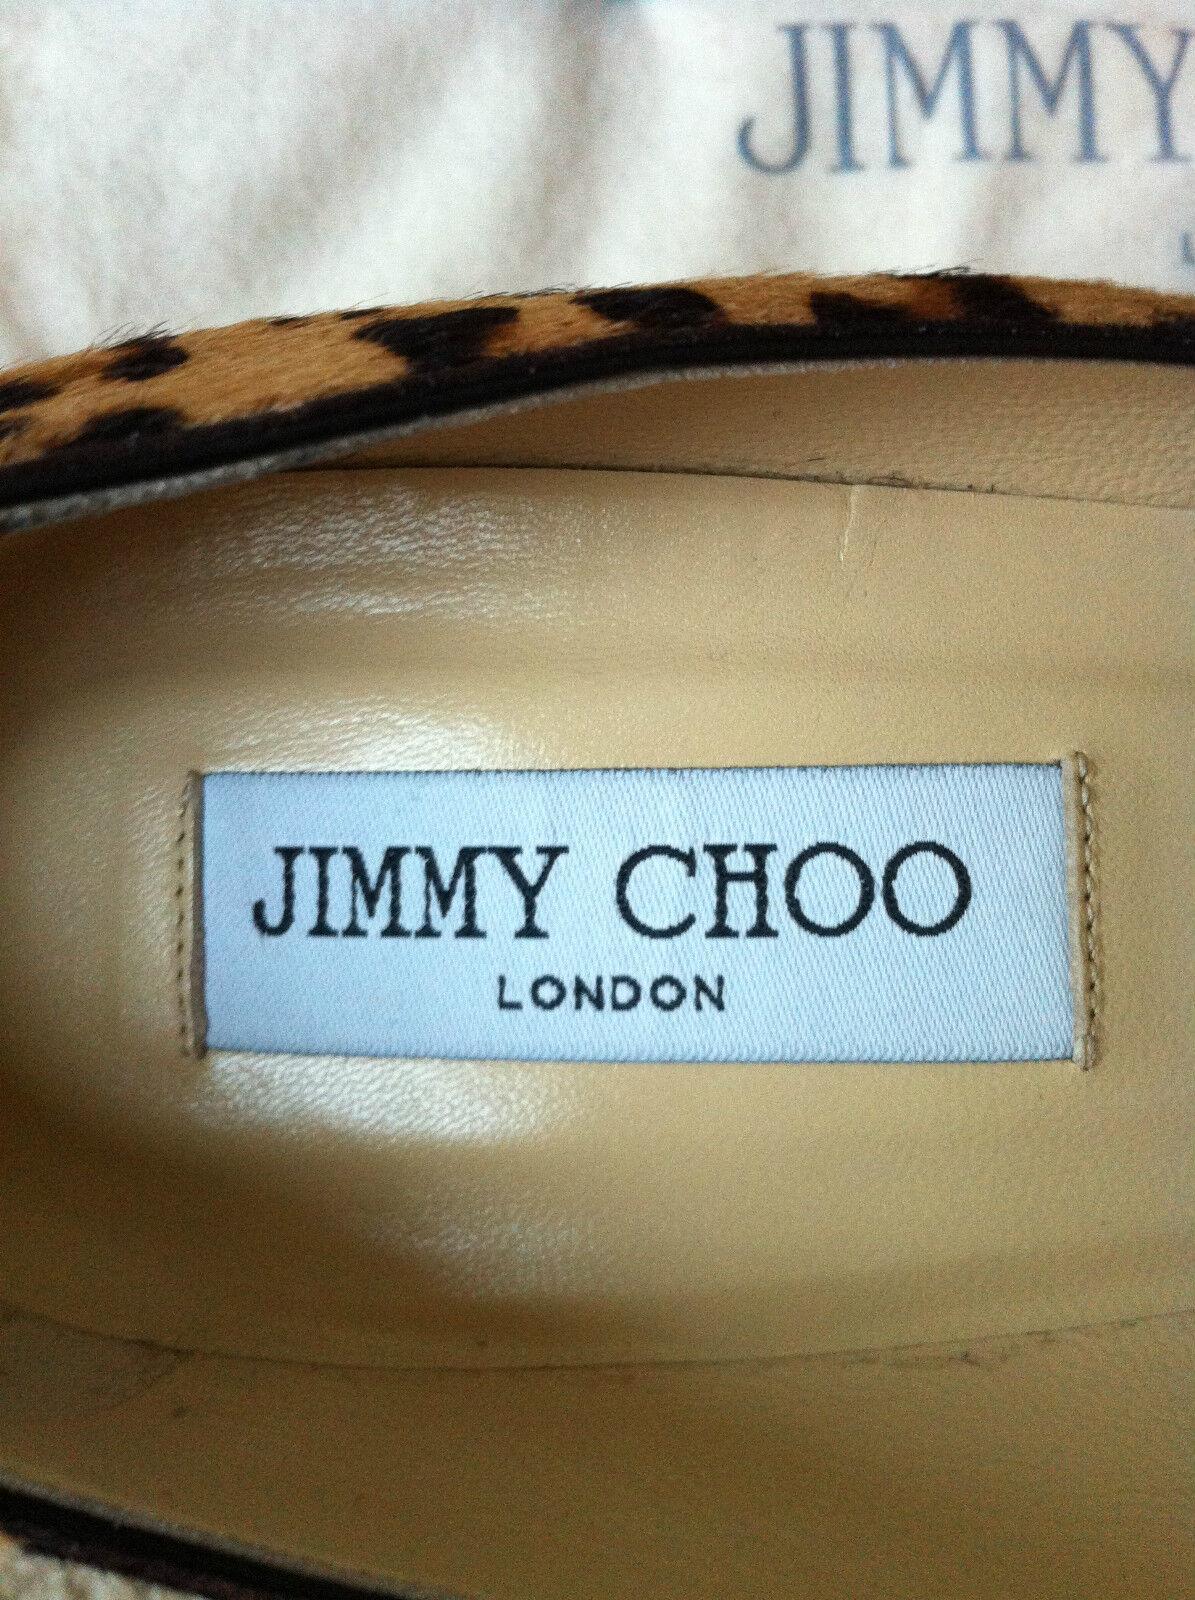 Jimmy Choo Cosmic Estampado de Leopardo Pony Cabello Punta Redonda 10 Bomba de plataforma Talla 10 Redonda 417712